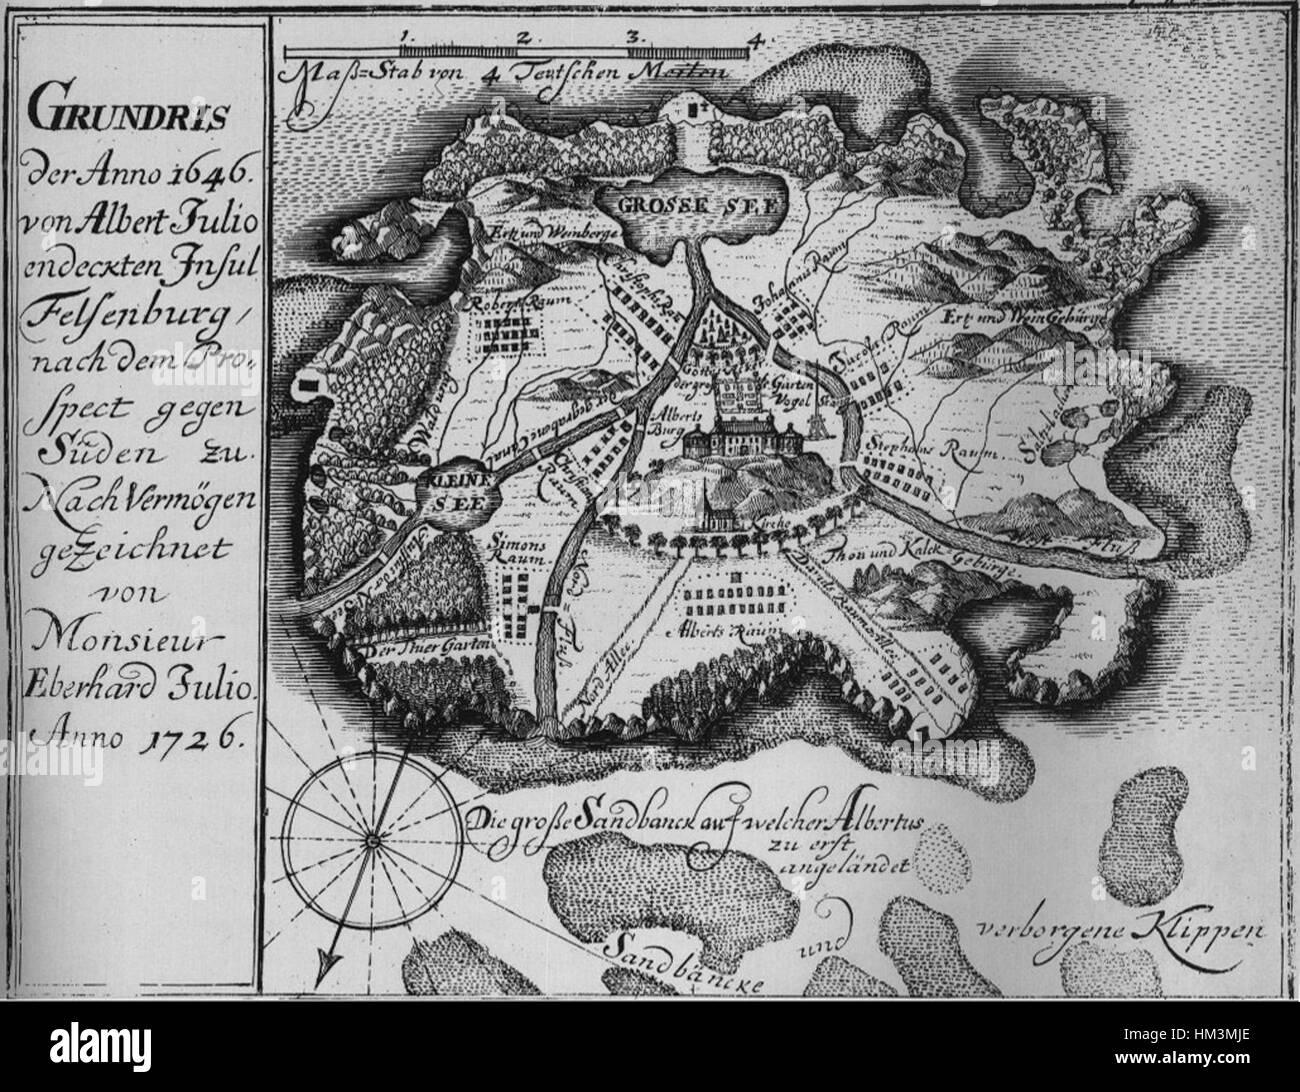 Insel Felsenburg map - Stock Image